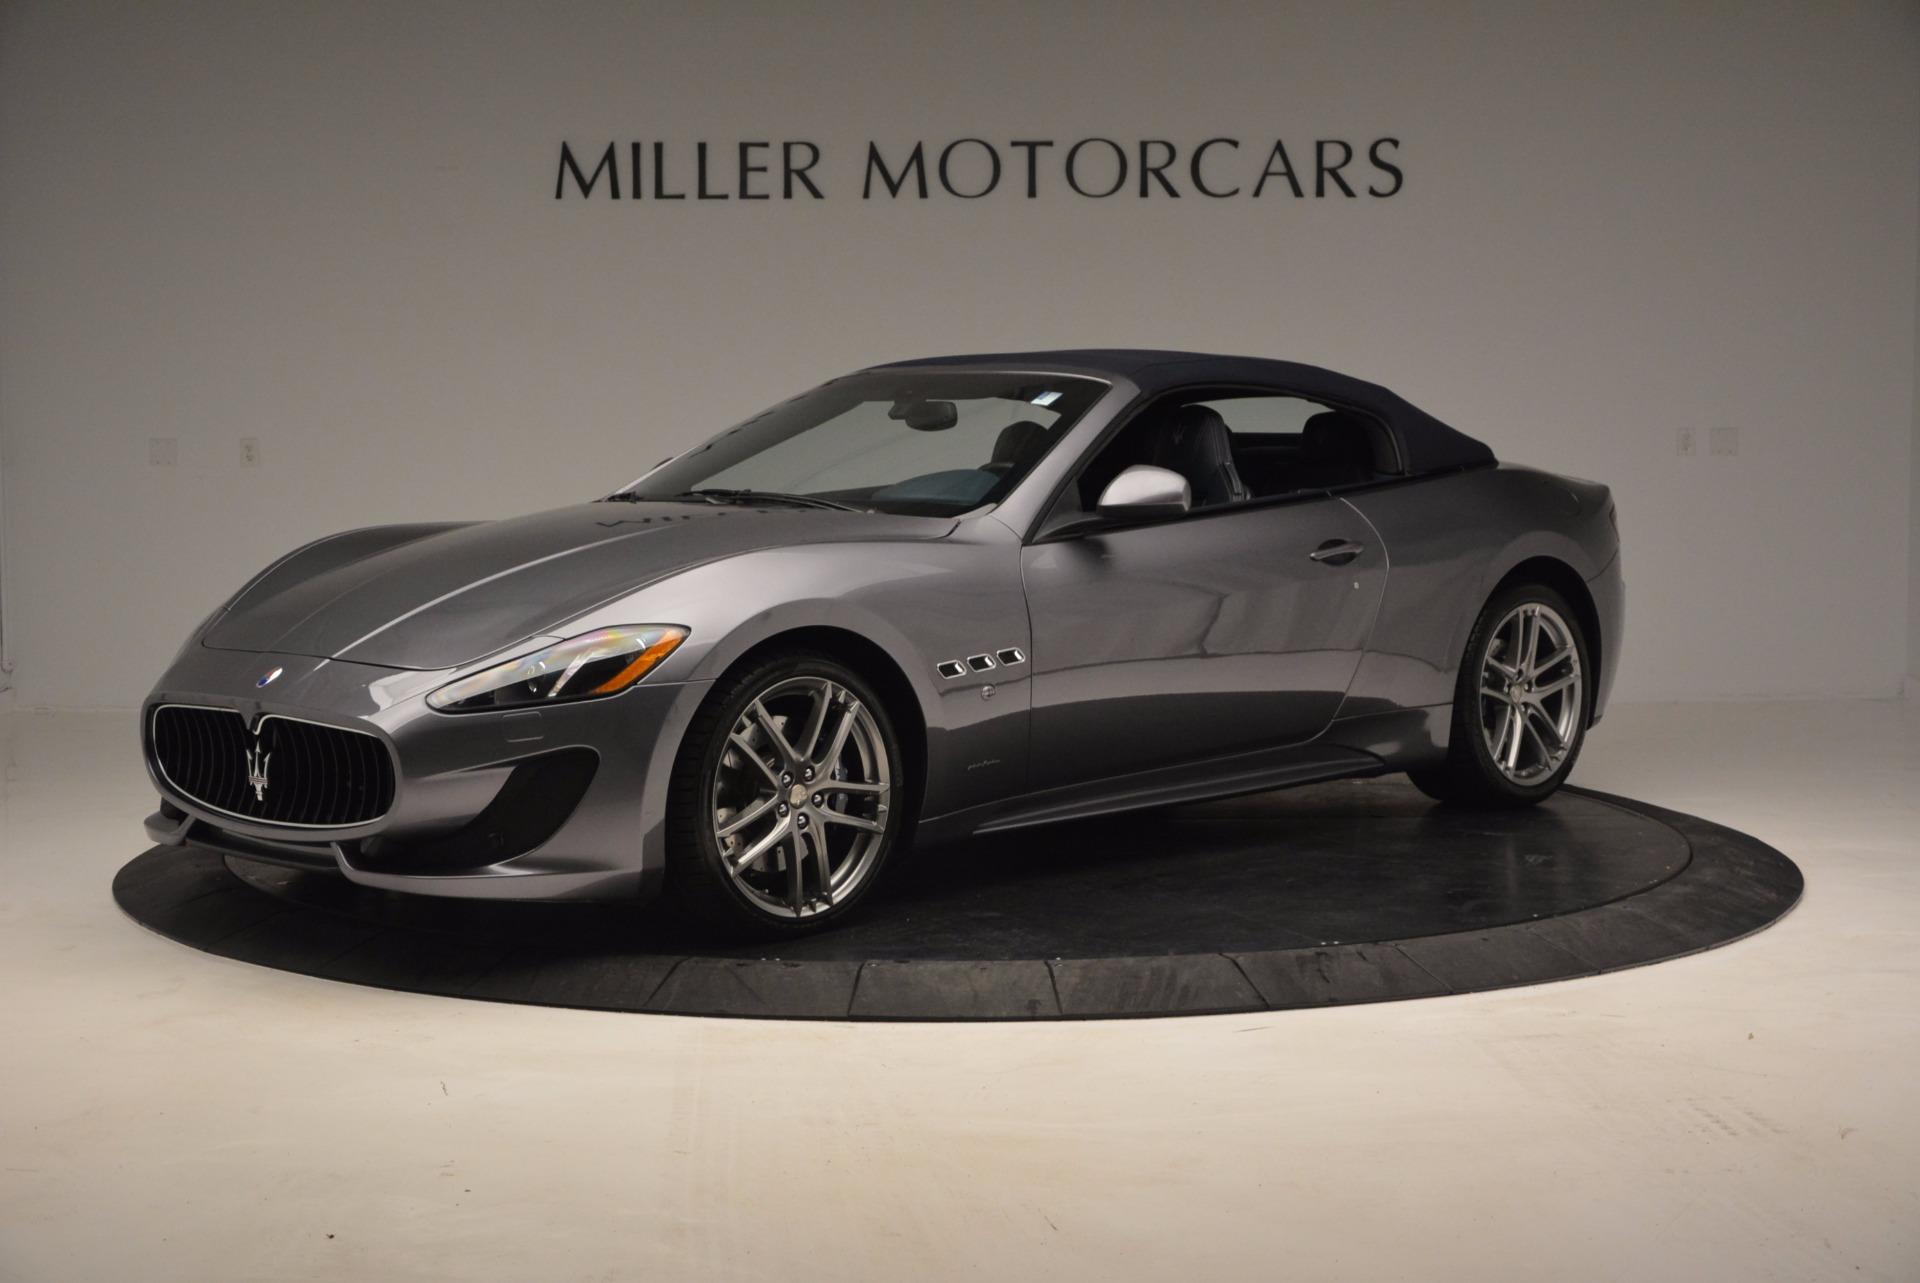 New 2016 Maserati GranTurismo Convertible Sport For Sale In Westport, CT 154_p11